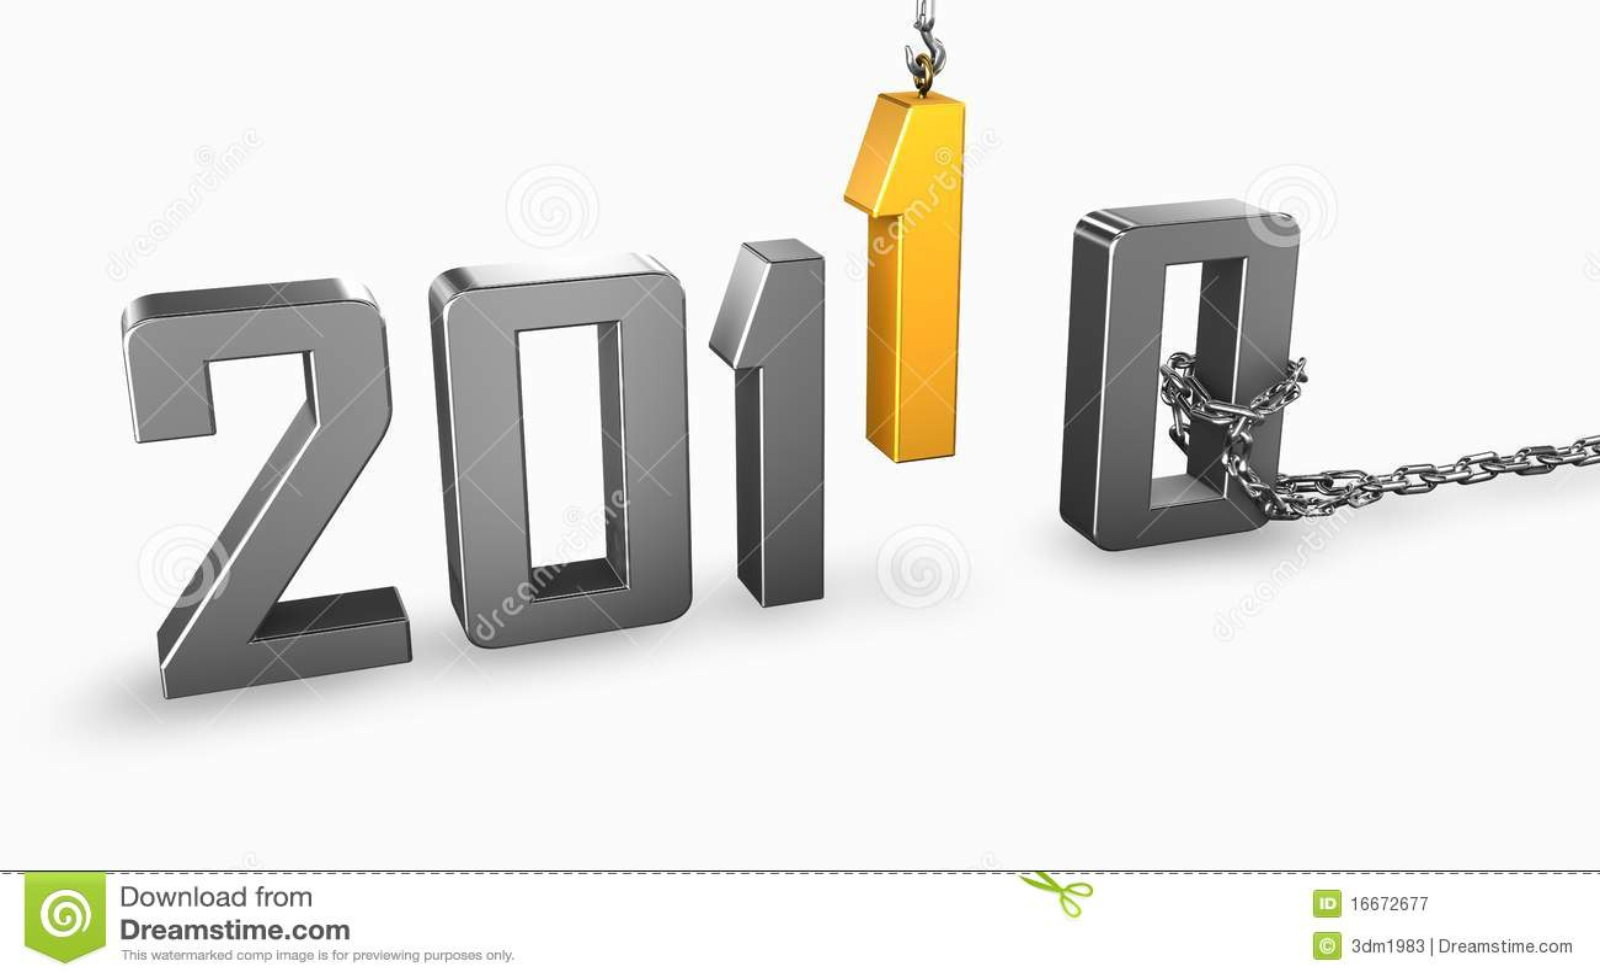 Golden new year 2011